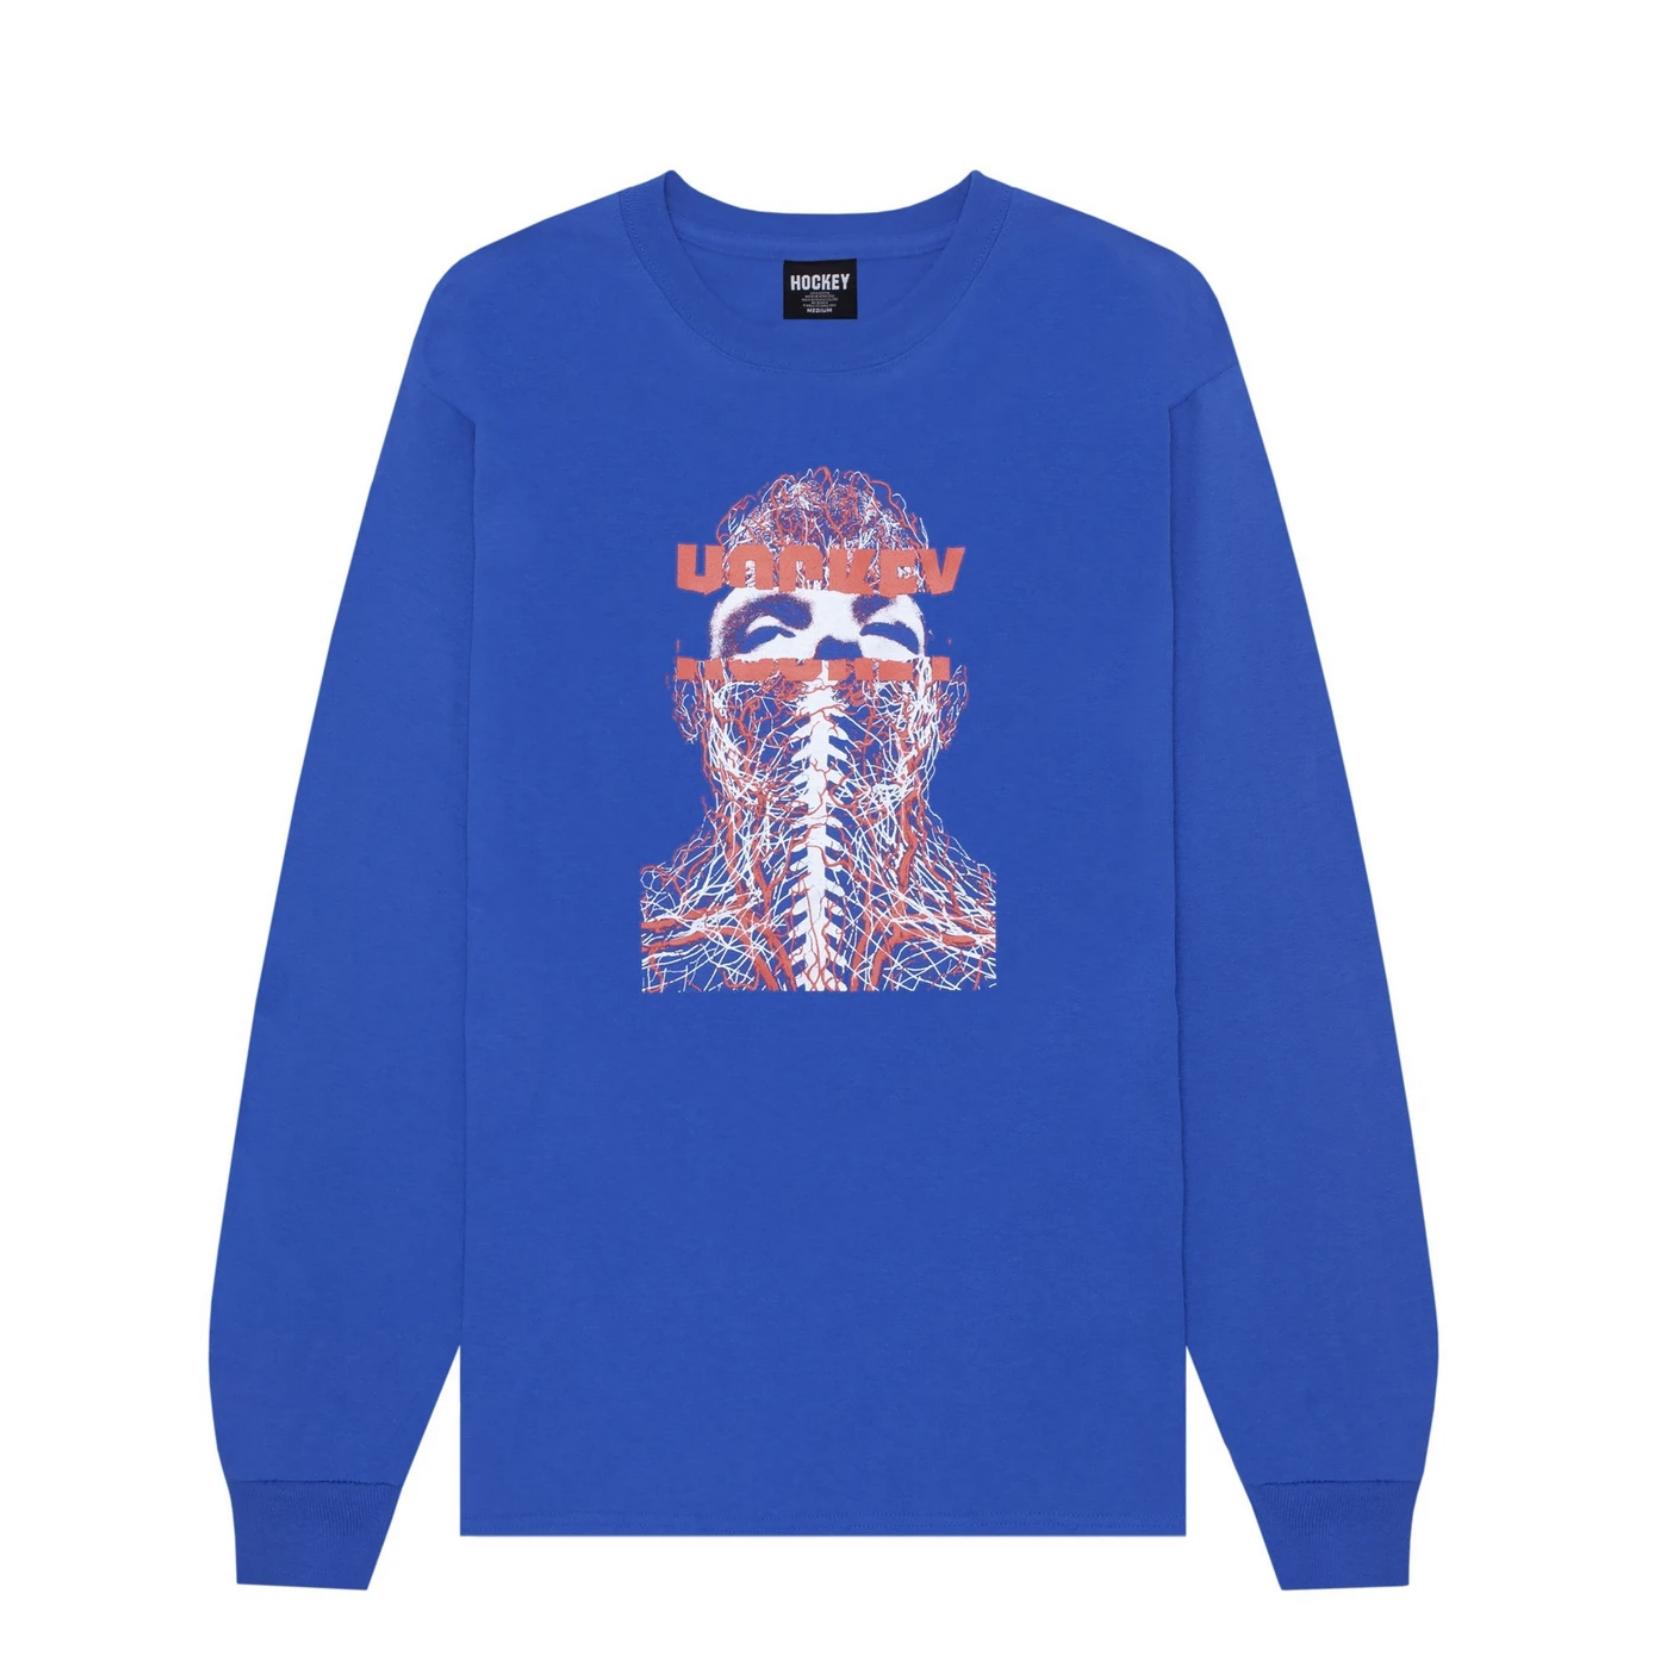 HOCKEY NERVES L/S TEE BLUE